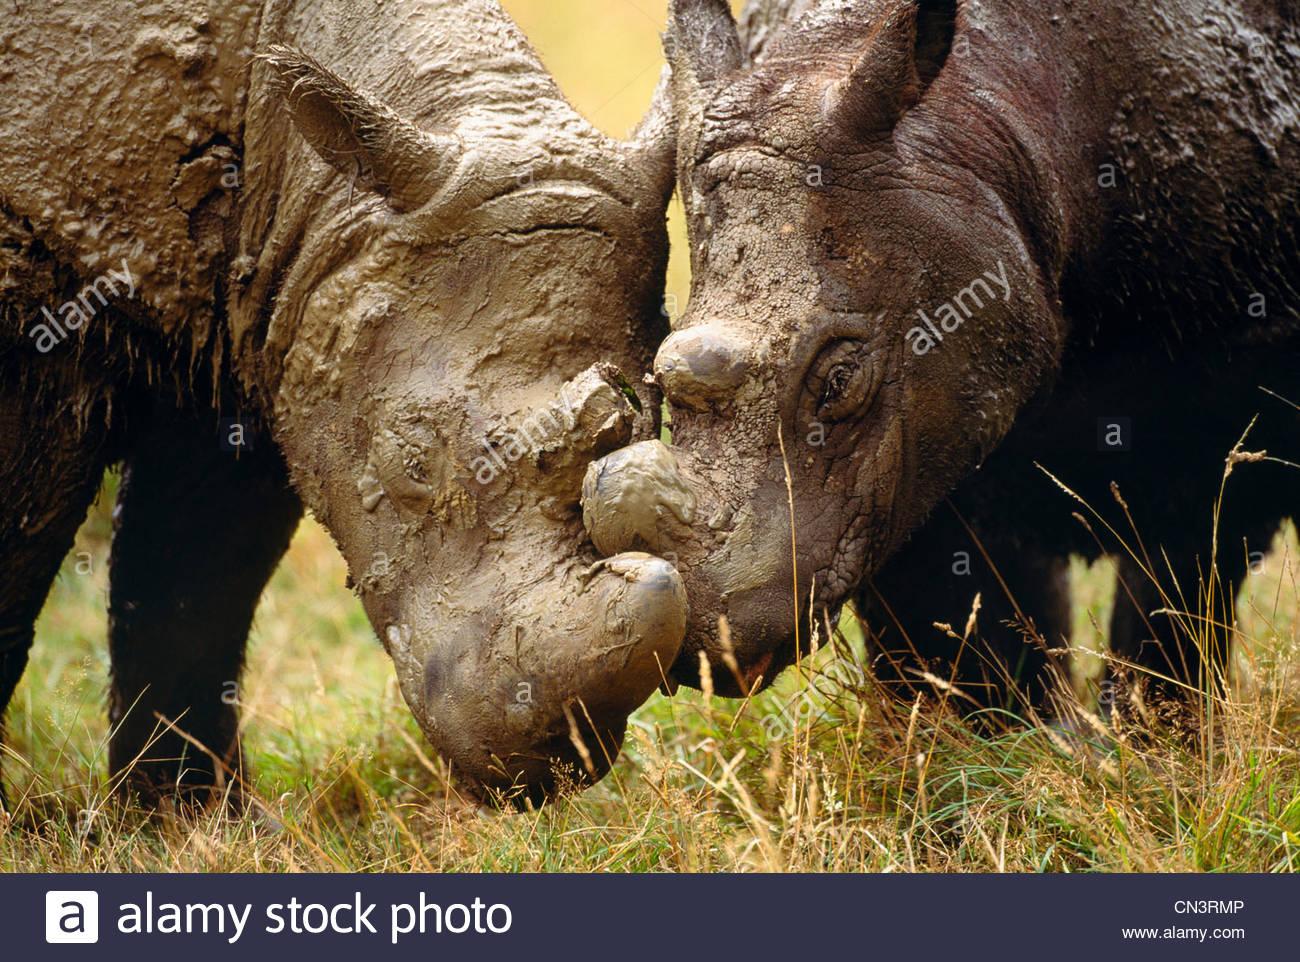 Sumatran rhinoceros, endemic to the rainforests of Indonesia - Stock Image